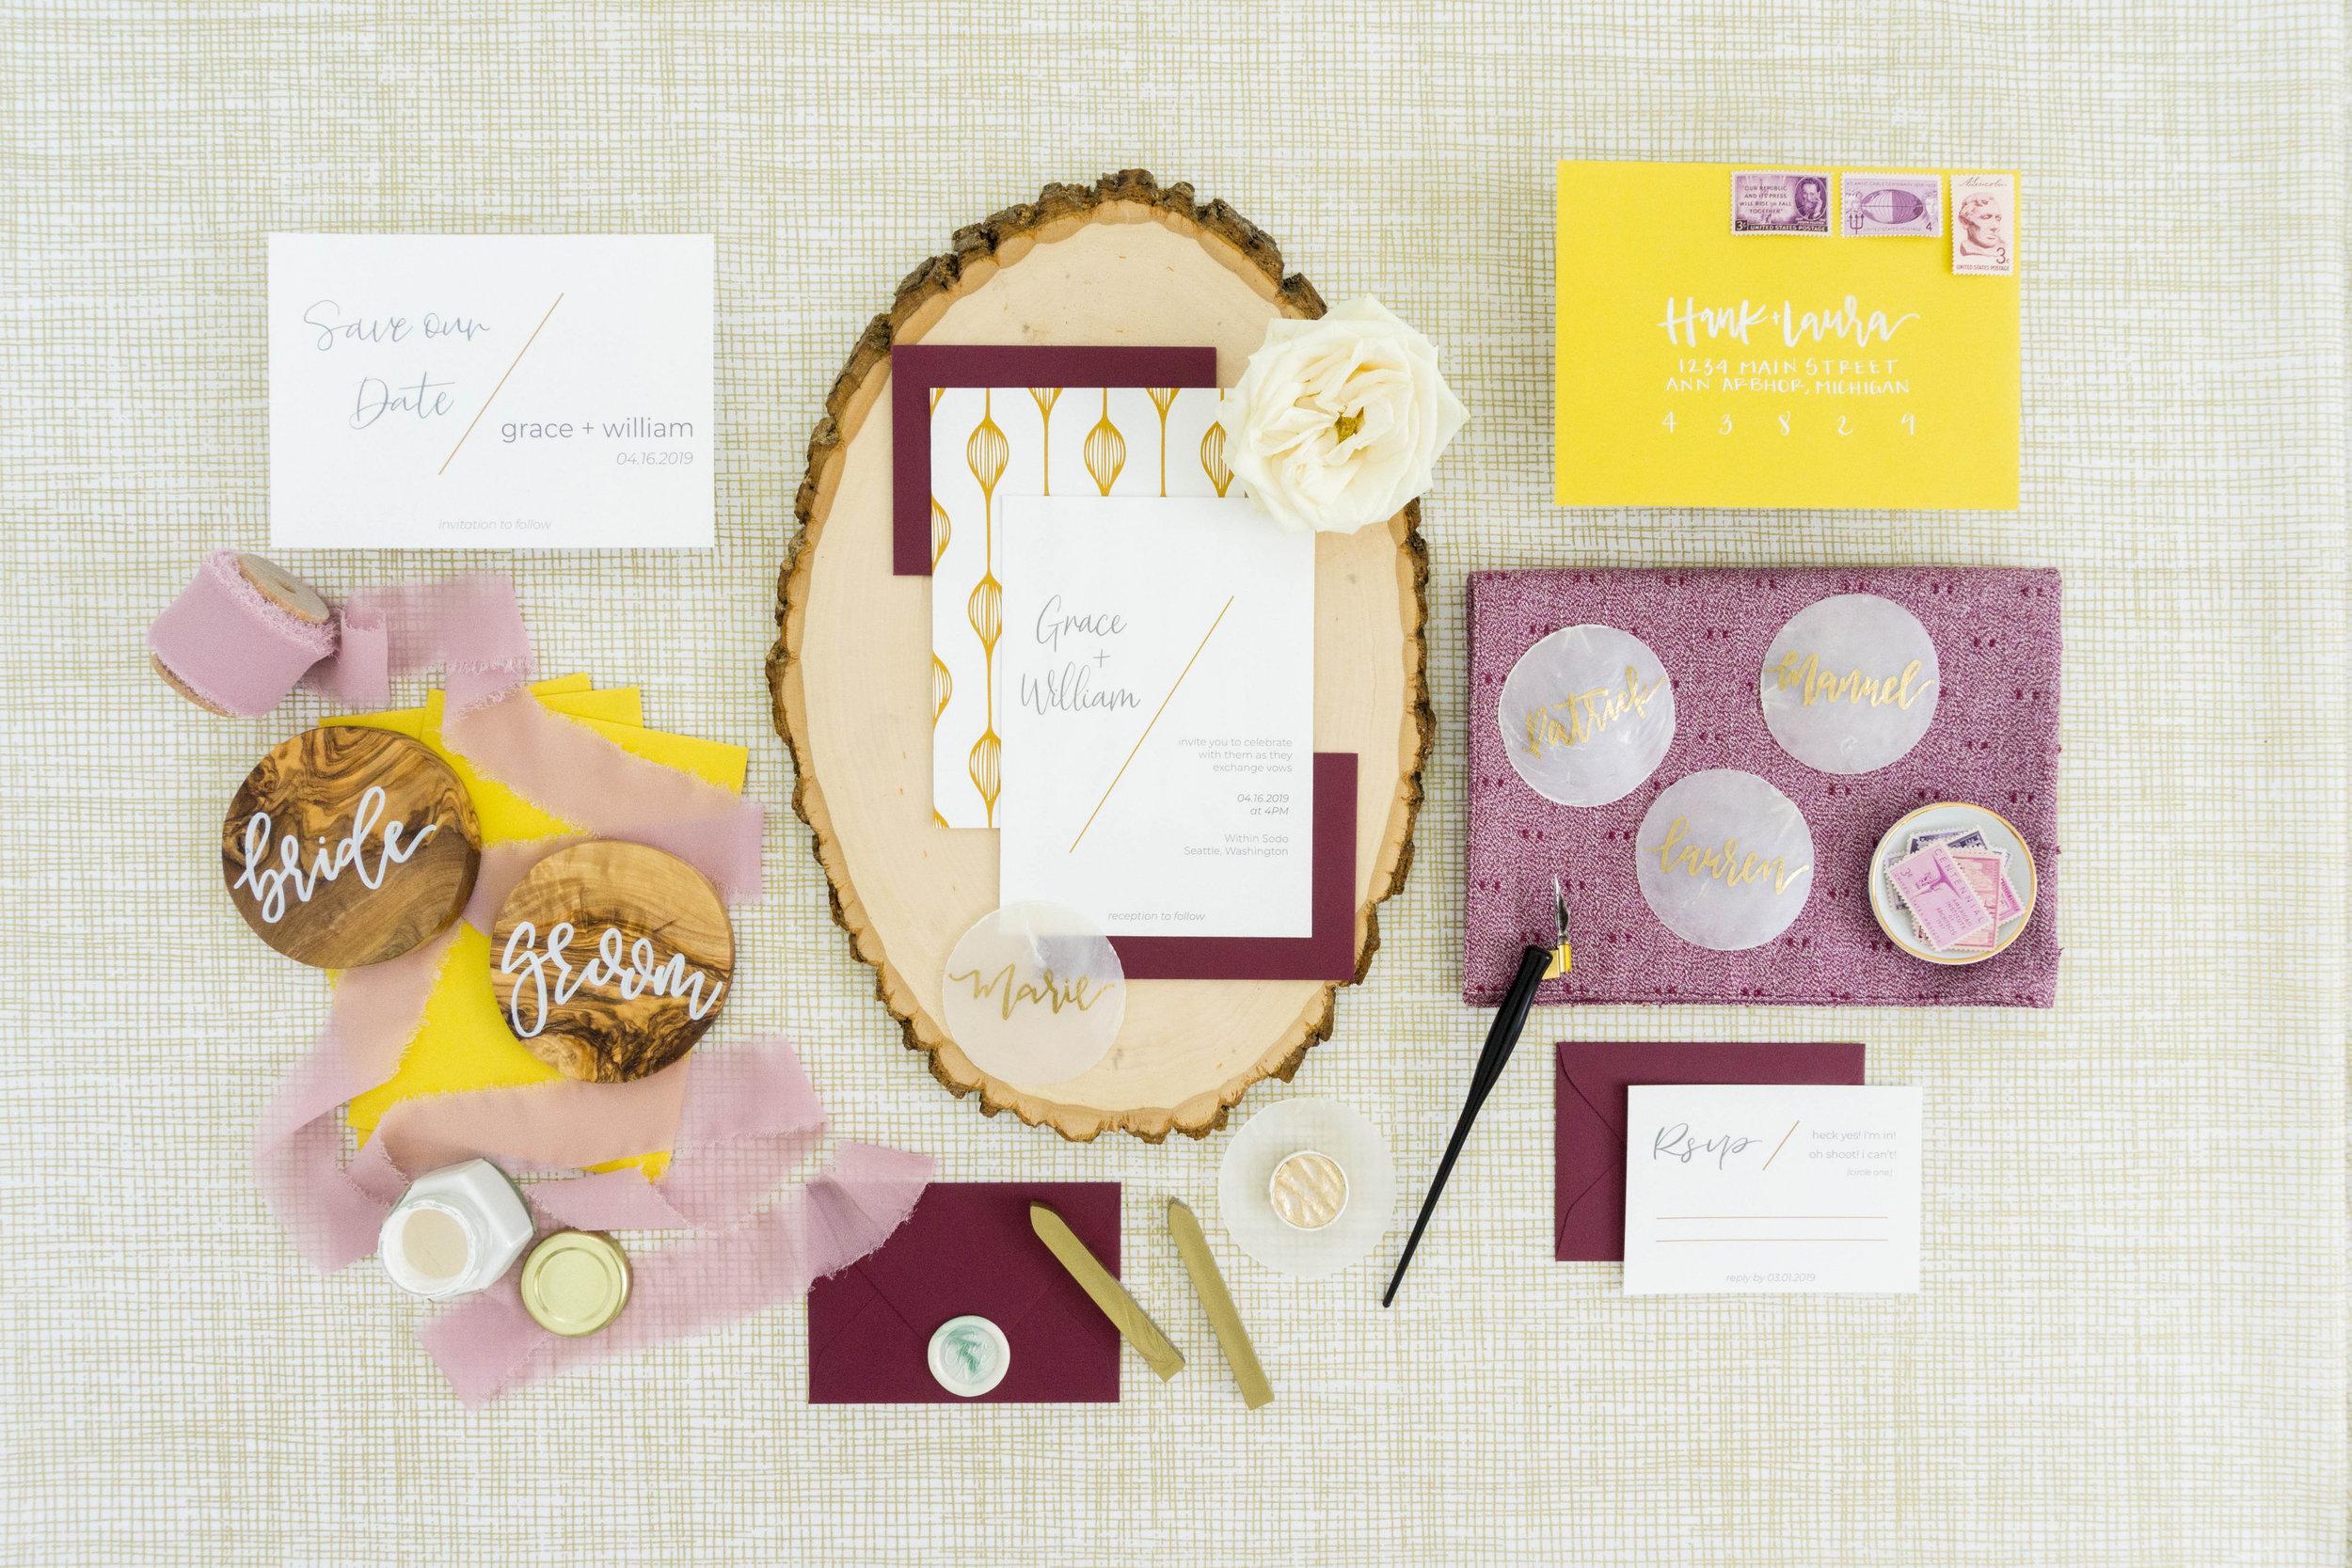 love-fern-design-studio-custom-wedding-invitations-for-the-modern-couple-modern-calligraphy-in-seattle-washington-custom-wedding-stationery-modern-minimal-wedding-invitations